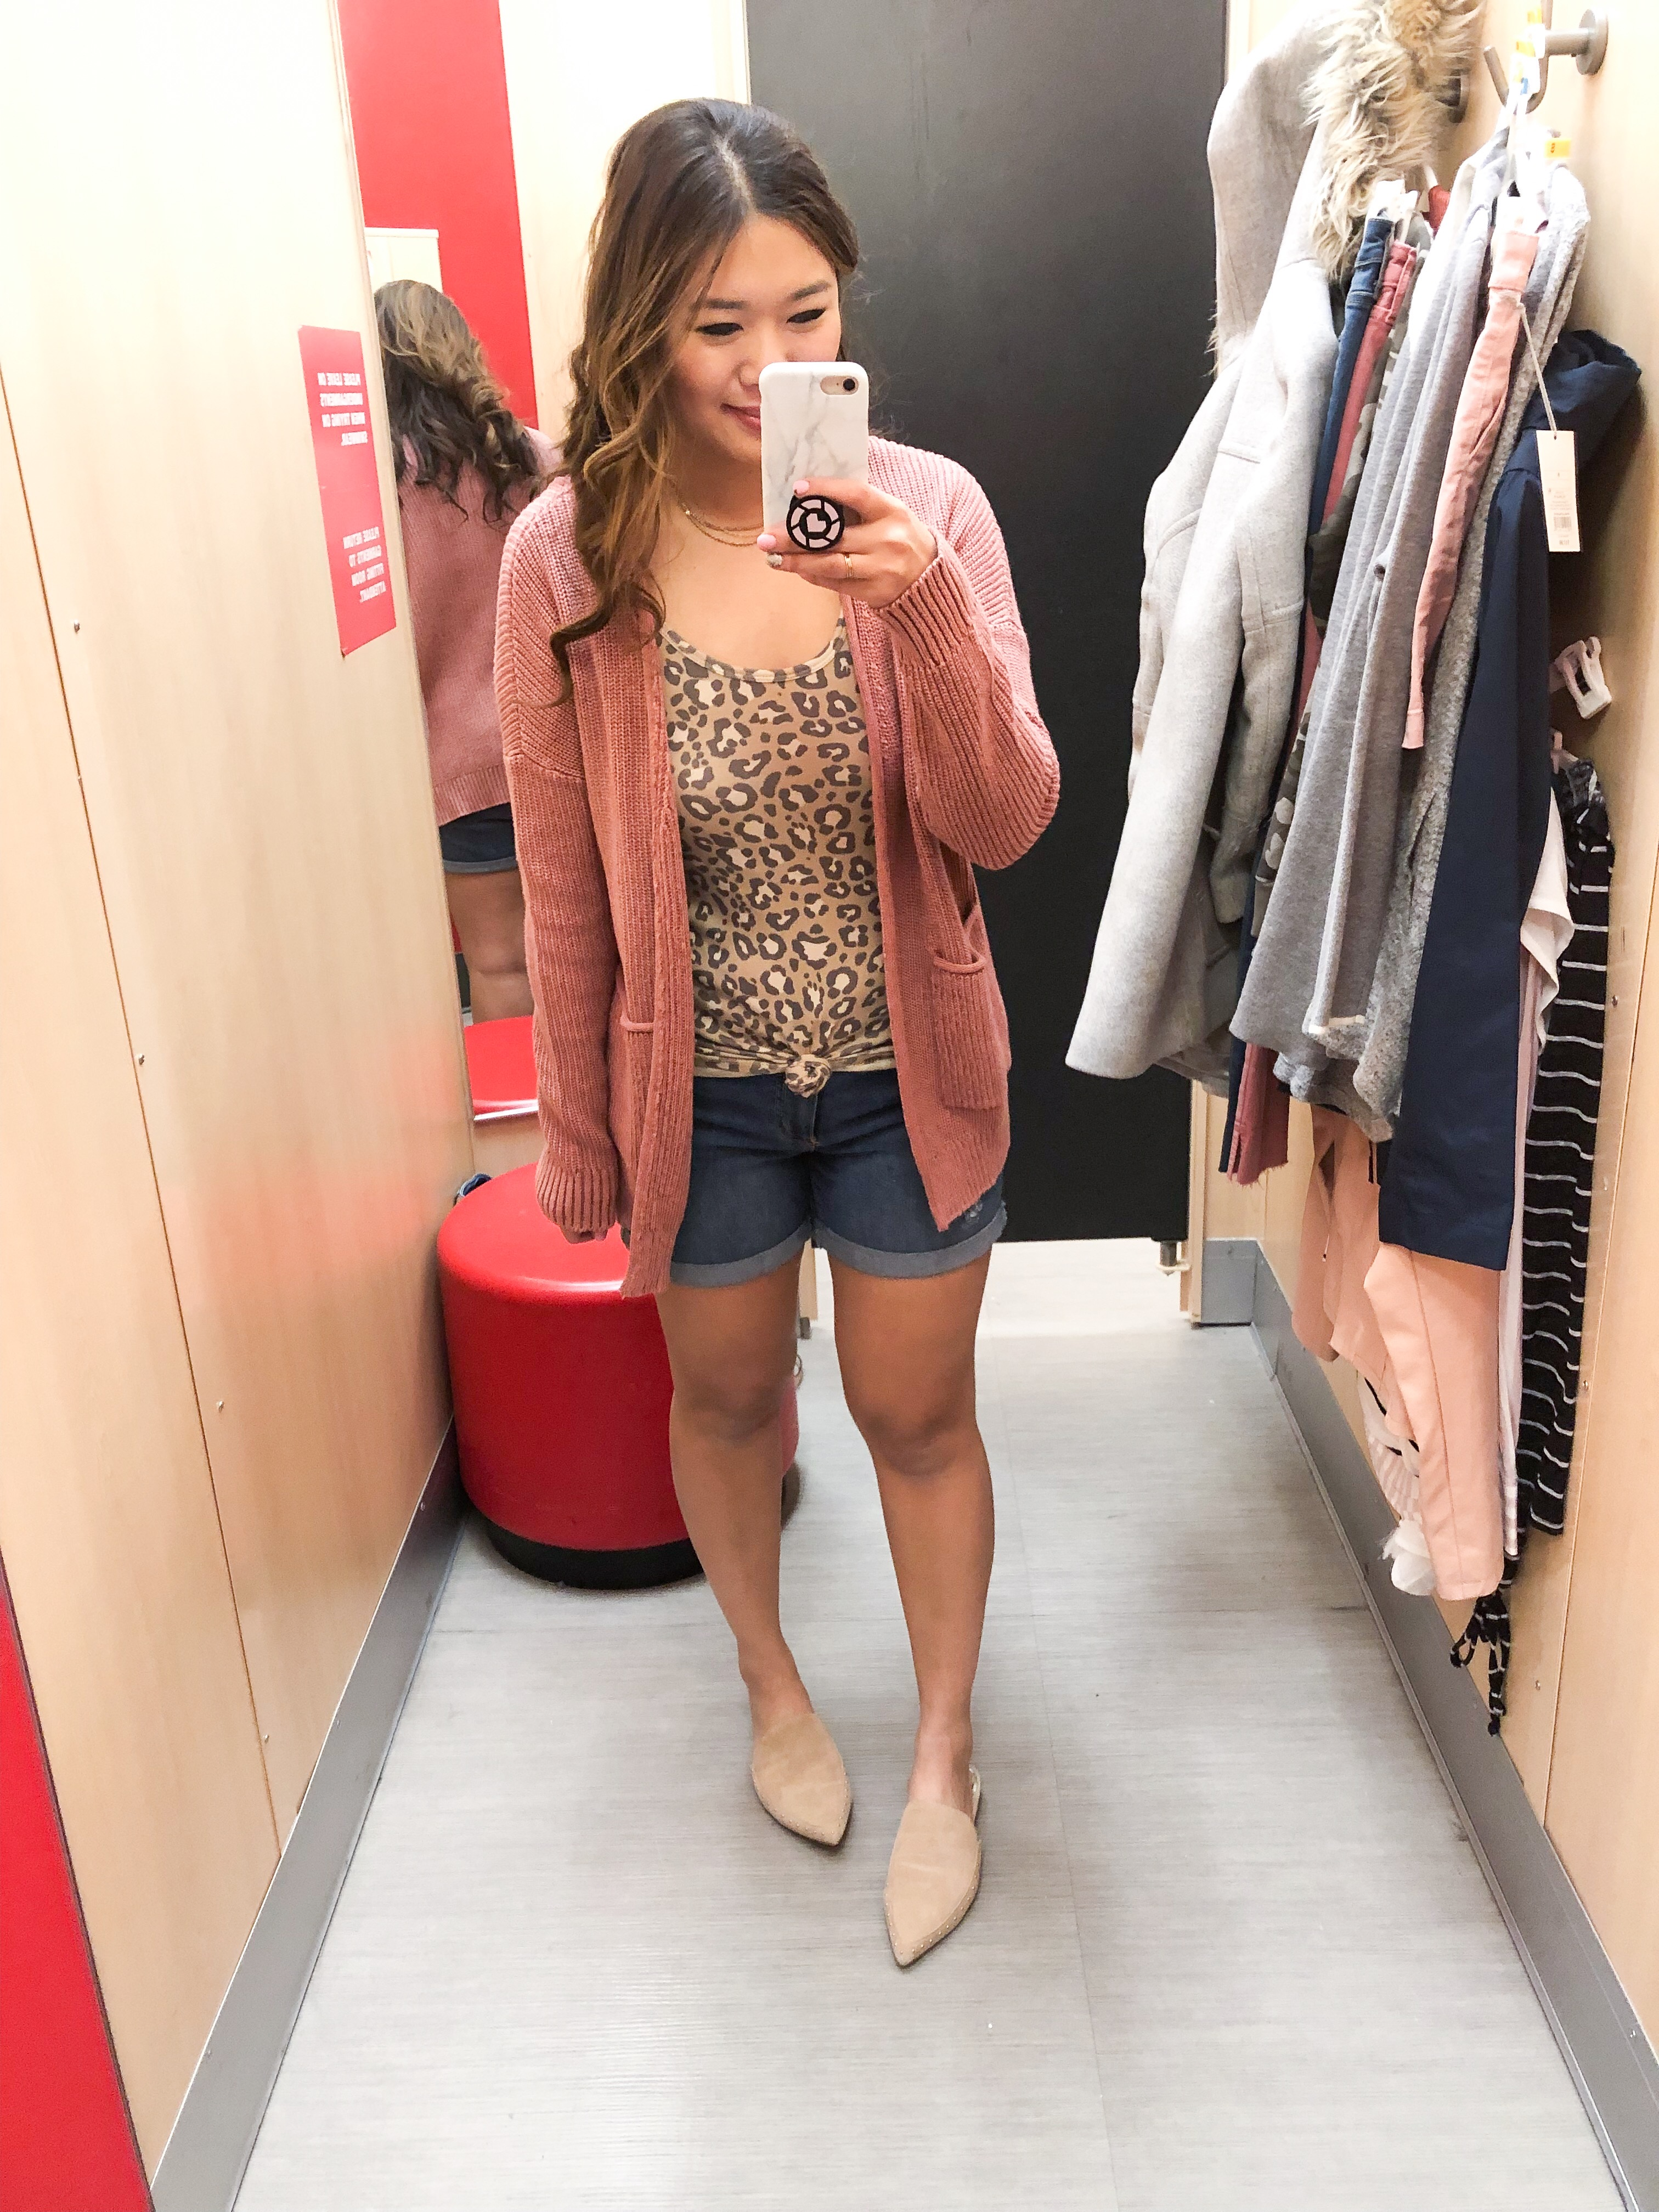 744eadfeb58 Target Dressing Room Try-On Session - February 2019